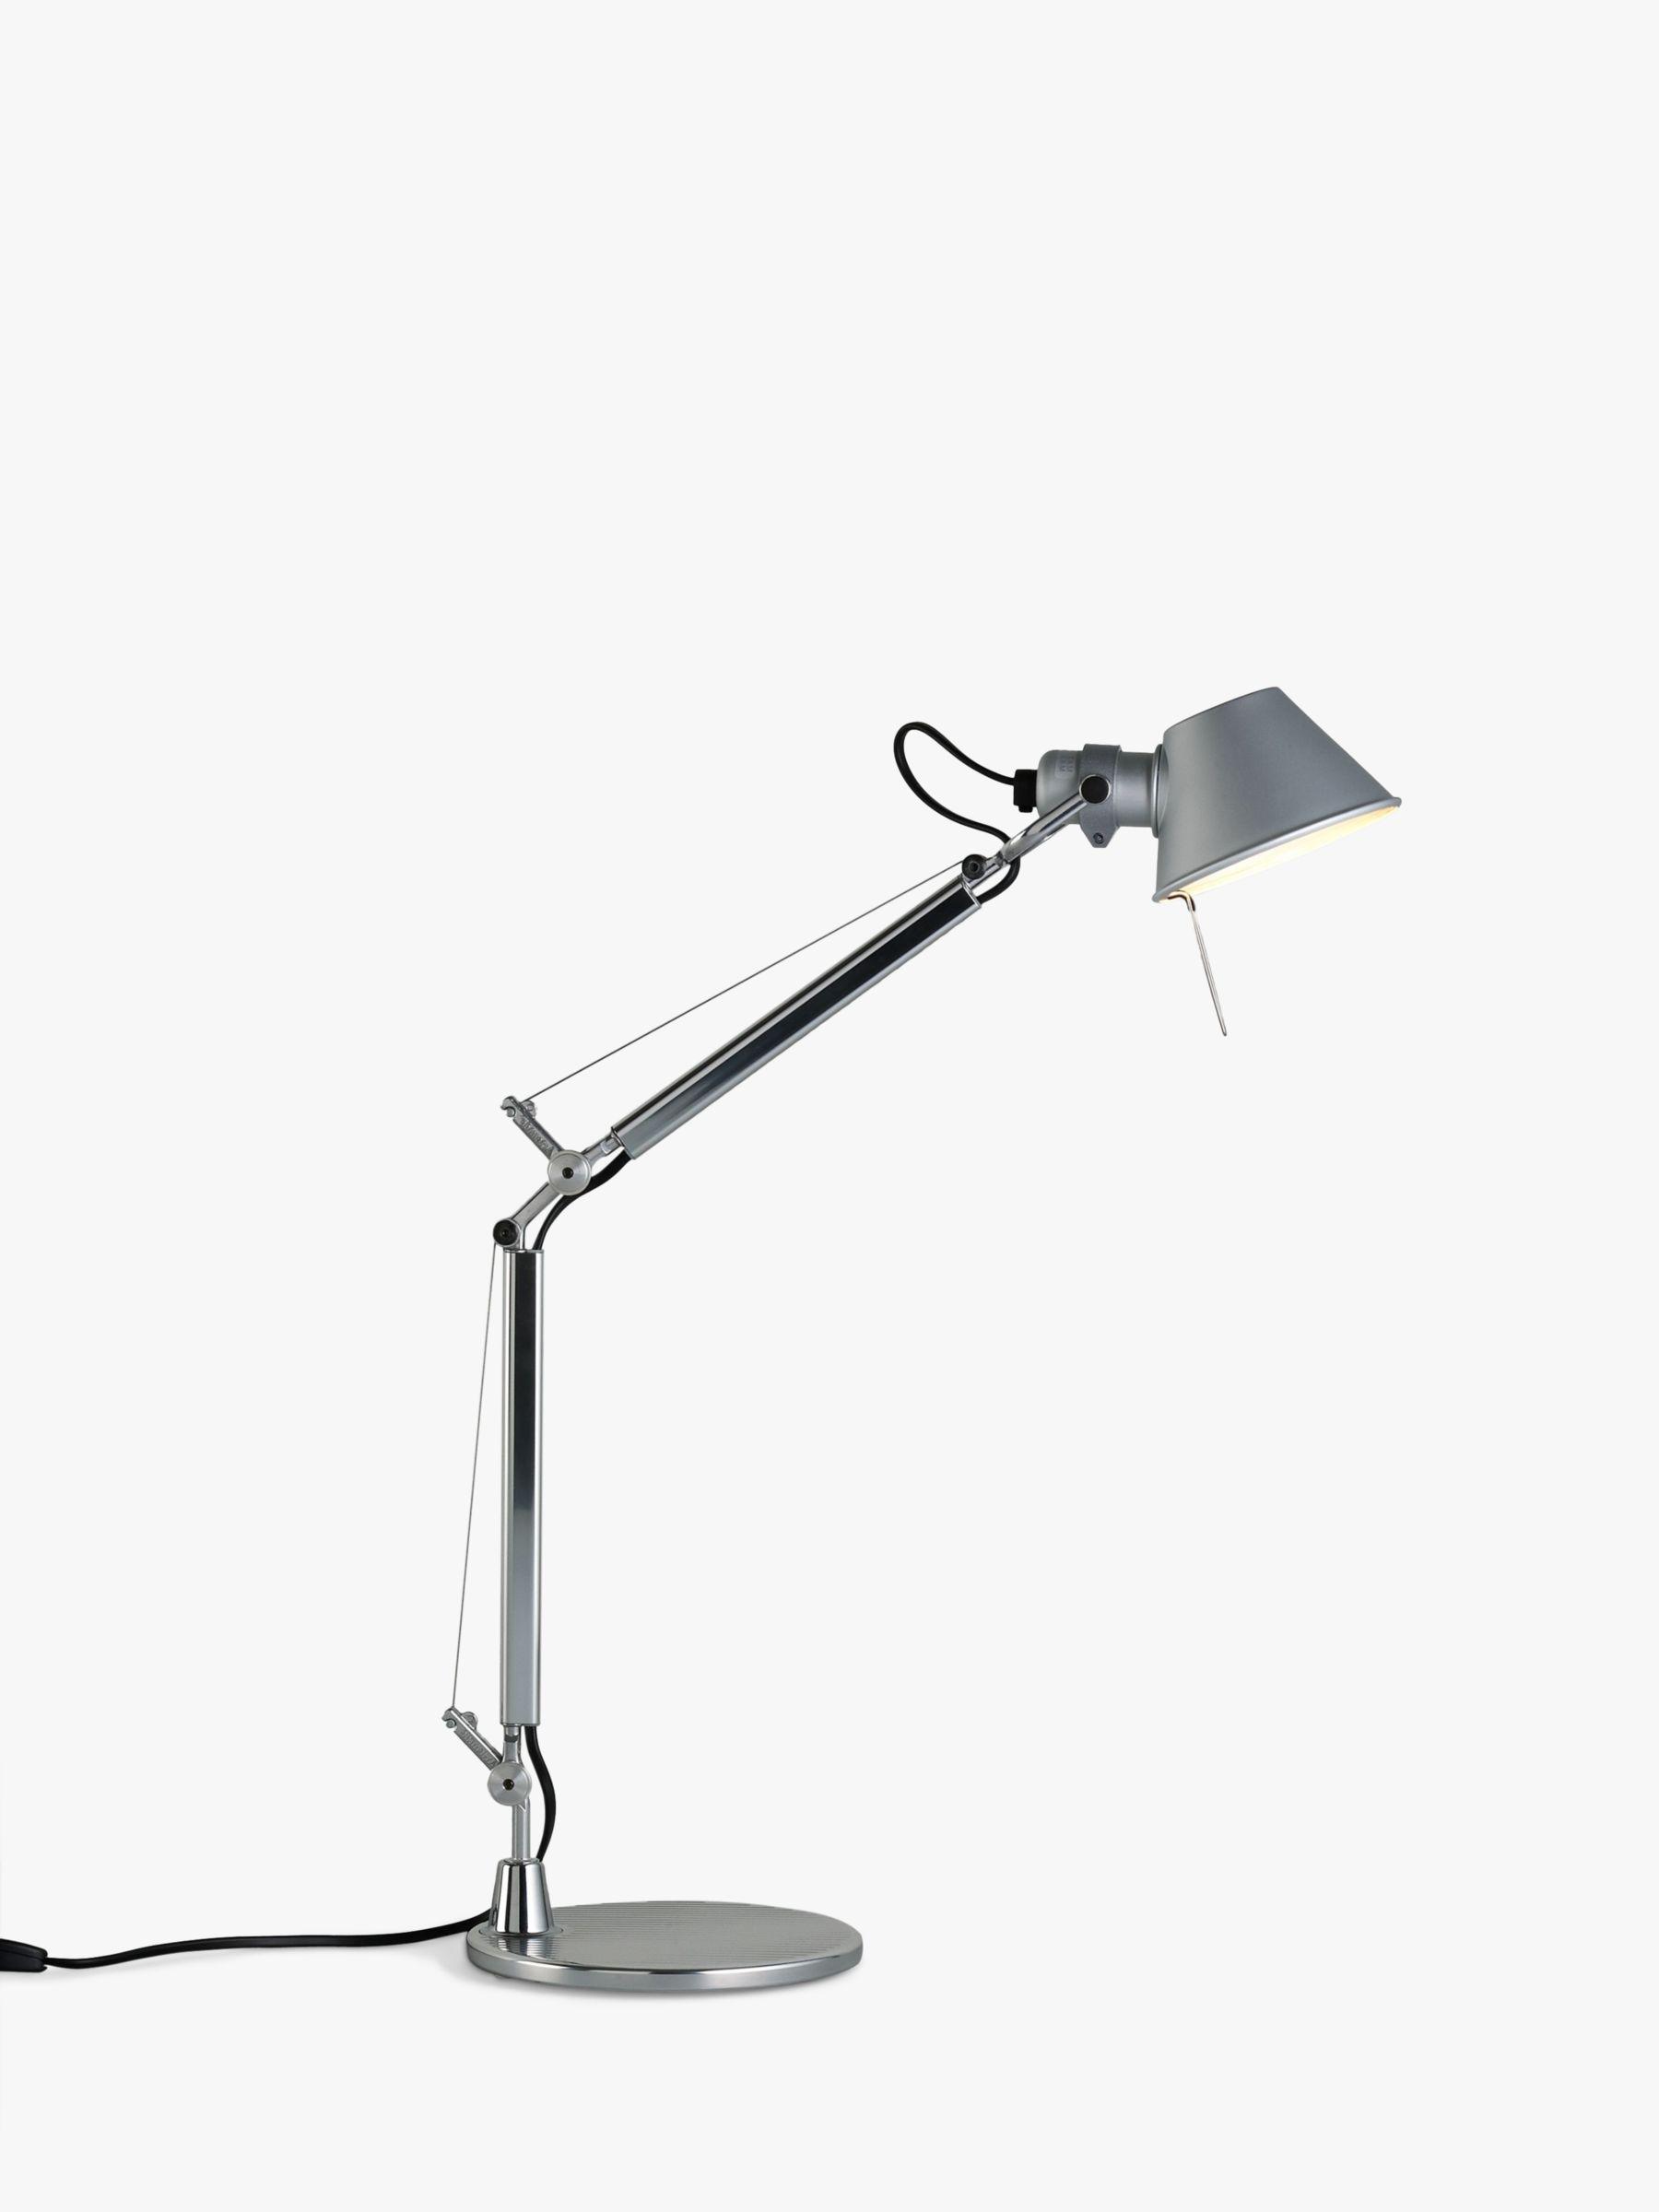 Creative Buy John Lewis Alpha LED Desk Lamp GoldBlack  John Lewis